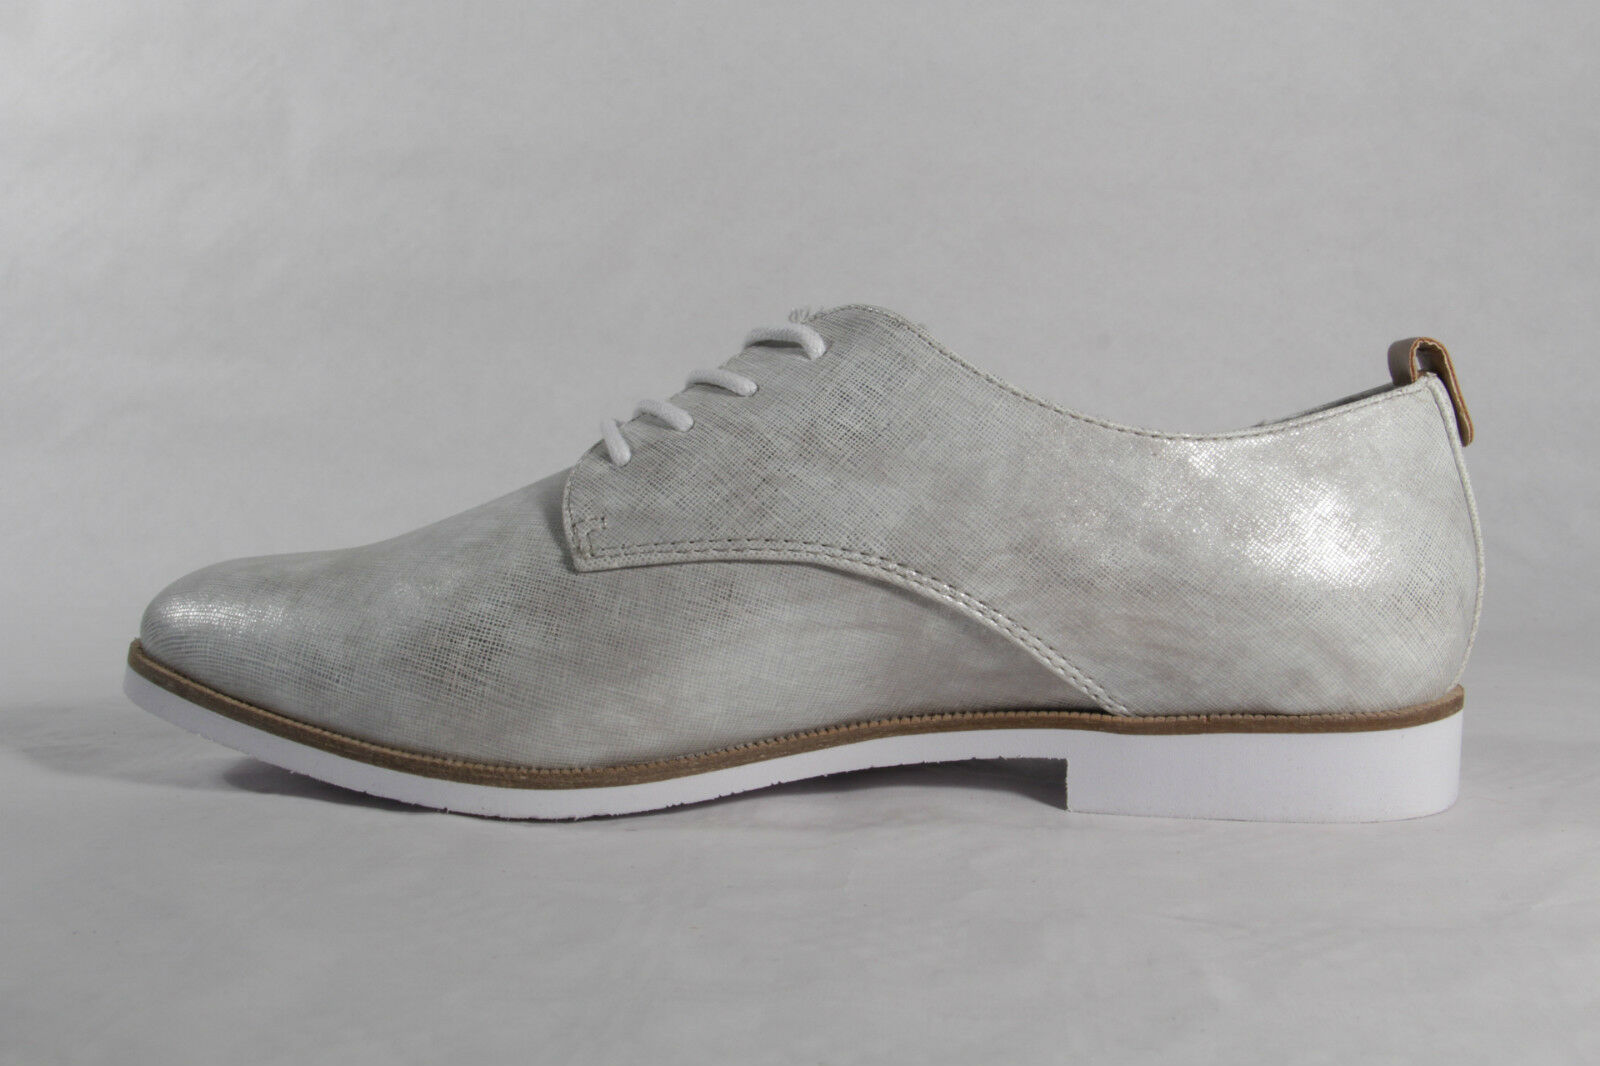 Bugatti Damen Schnürschuhe Turnschuhe Halbschuhe offWeiß NEU    | Leicht zu reinigende Oberfläche  34bcb0